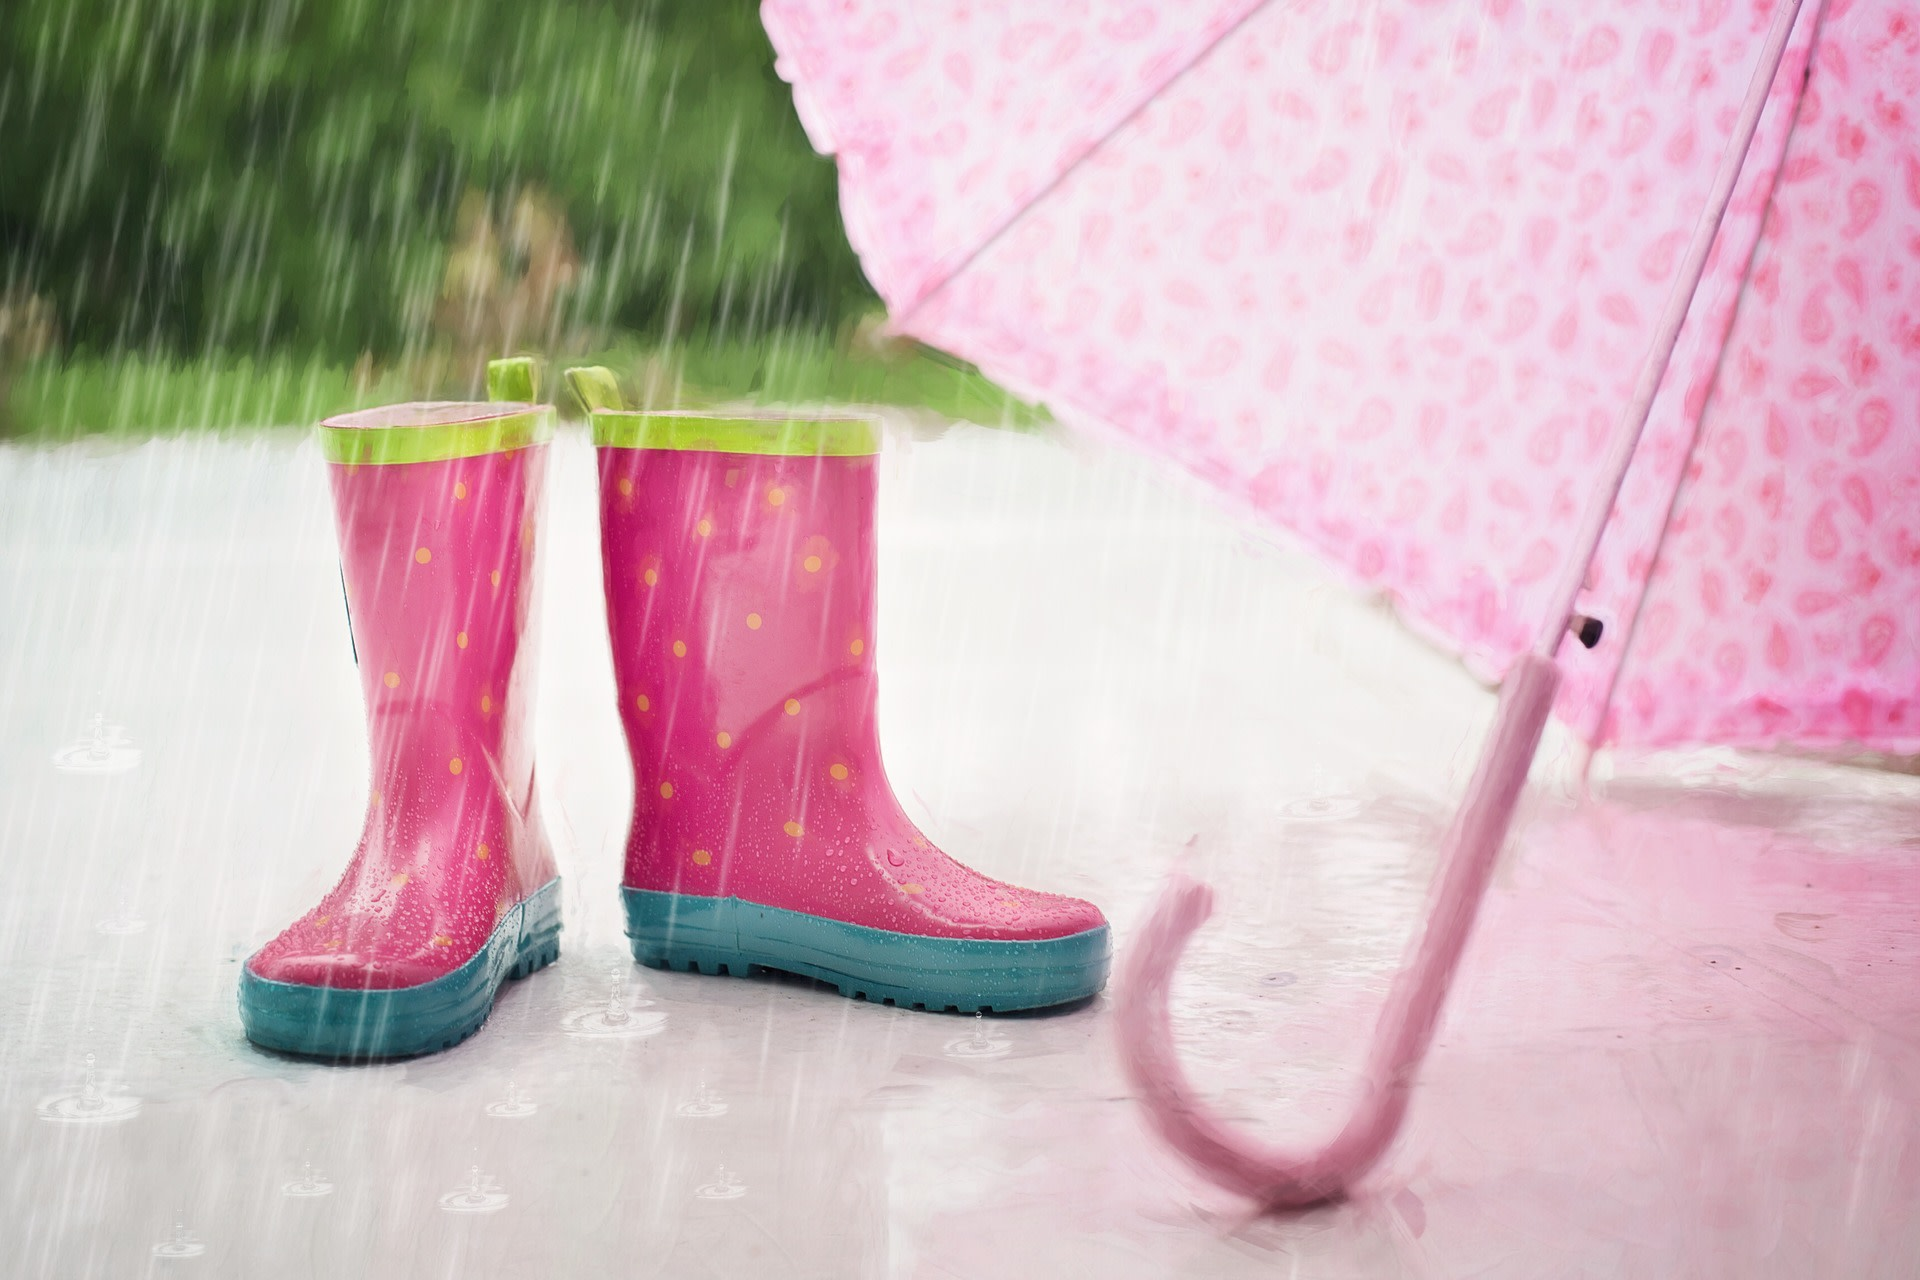 Can I Open An Umbrella On Shabbat?